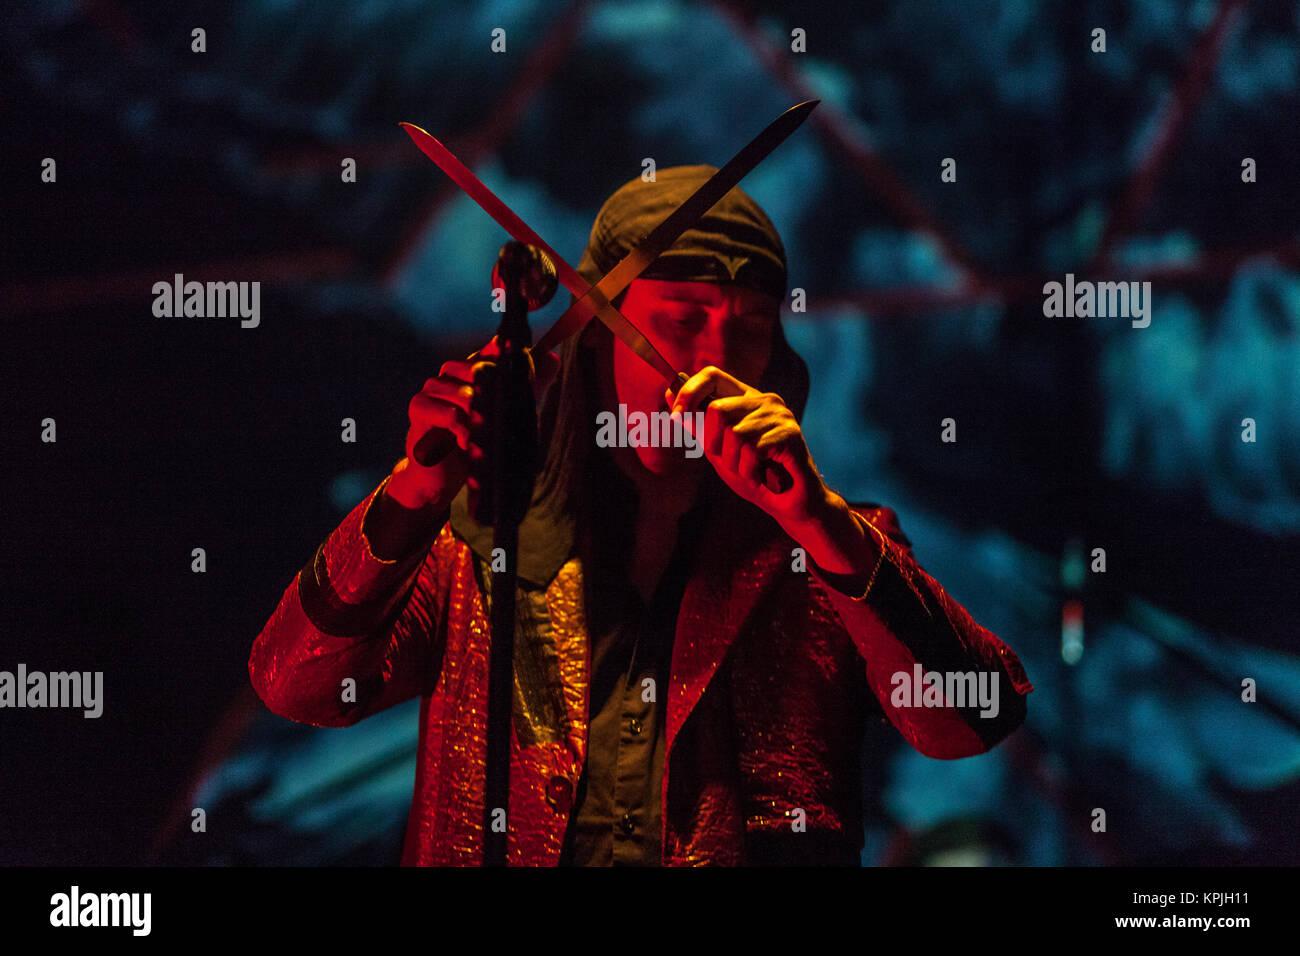 Zagreb, Croatia. 15th December, 2017. Laibach, Tvornica Kulture, Zagreb – photo: Deyan Baric – Credit: Deyan Baric/Alamy - Stock Image